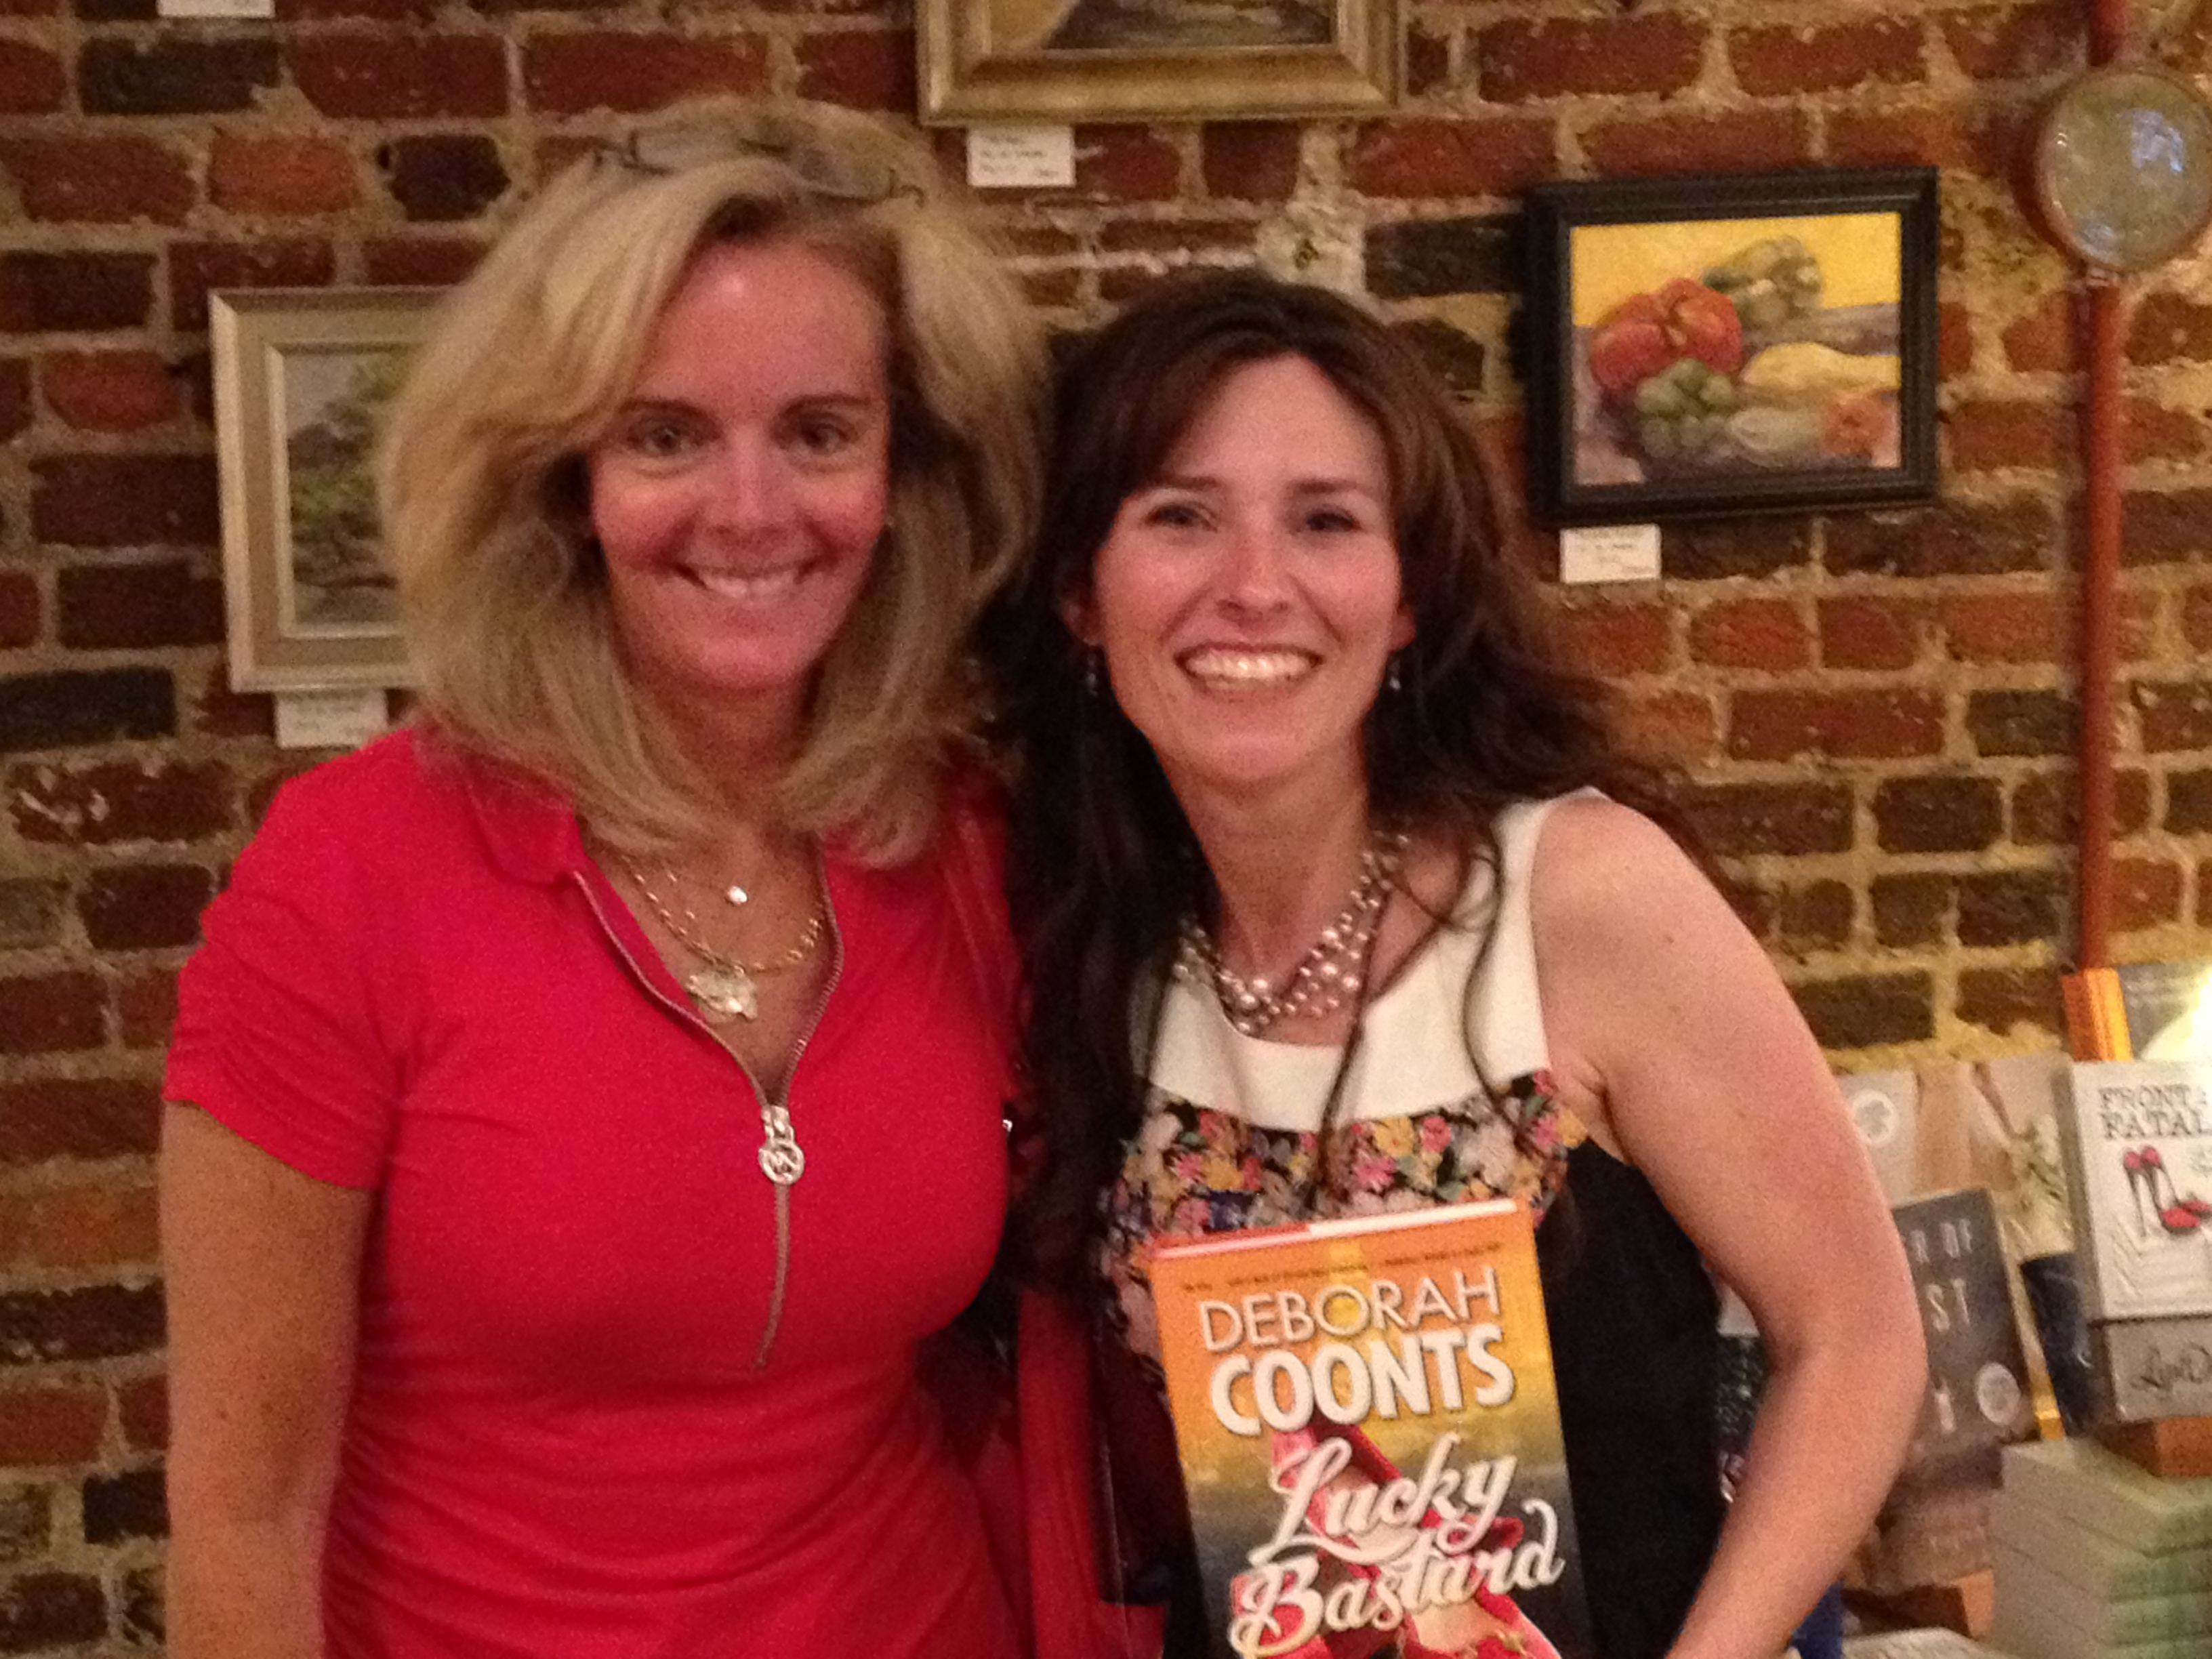 mystery writer Deborah Coontz